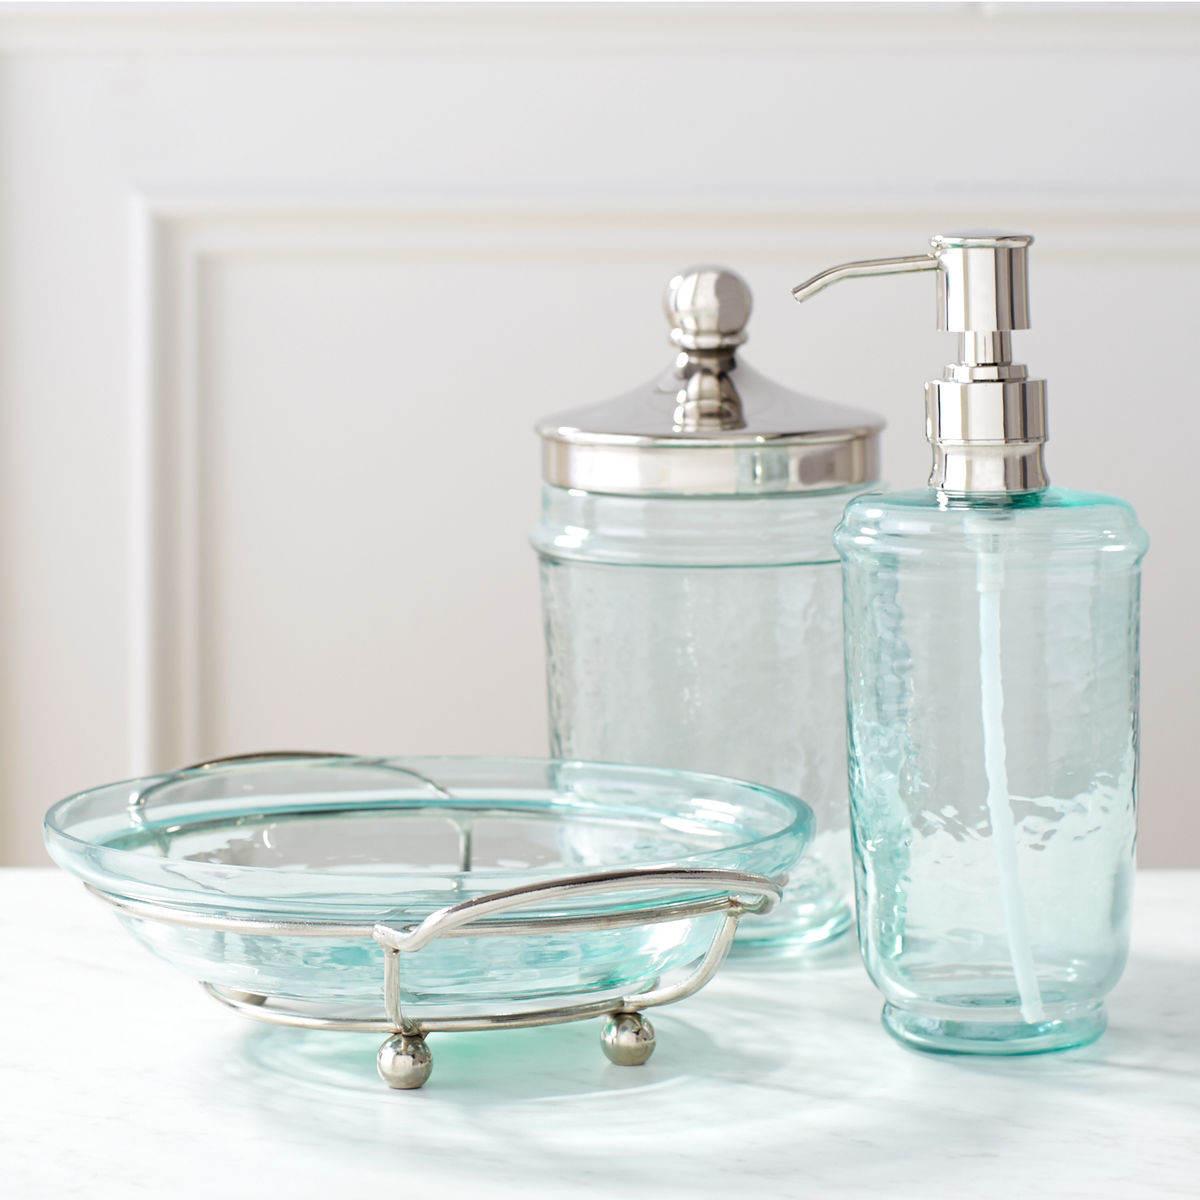 Oasis Bathroom Accessories